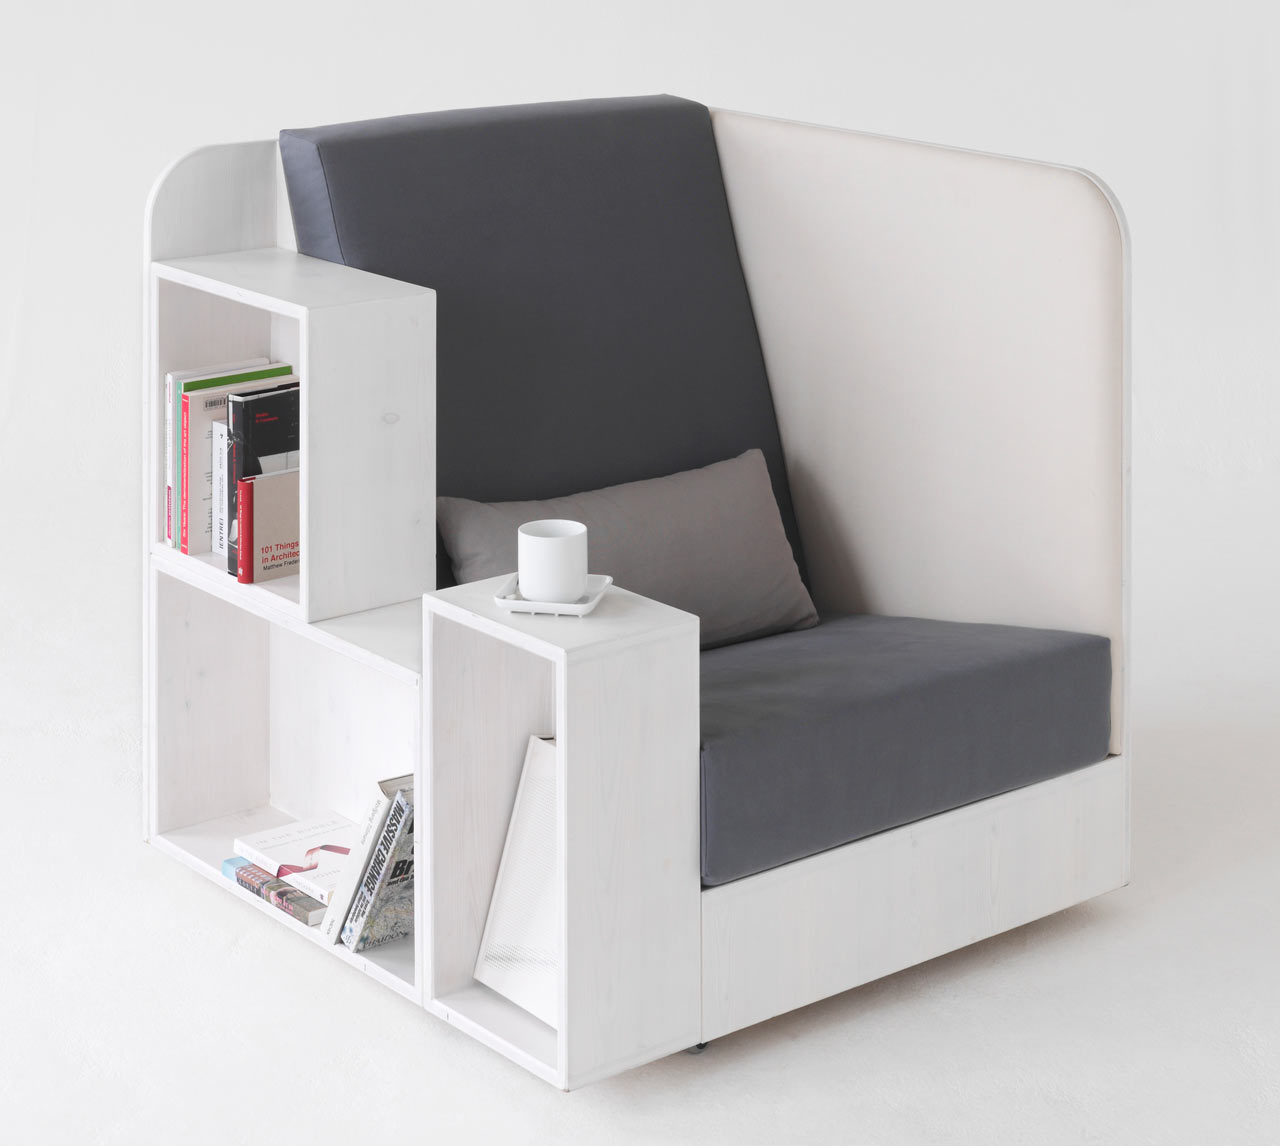 Creativo Sill N Multiusos Quiero M S Dise O # Muebles Ultramodernos